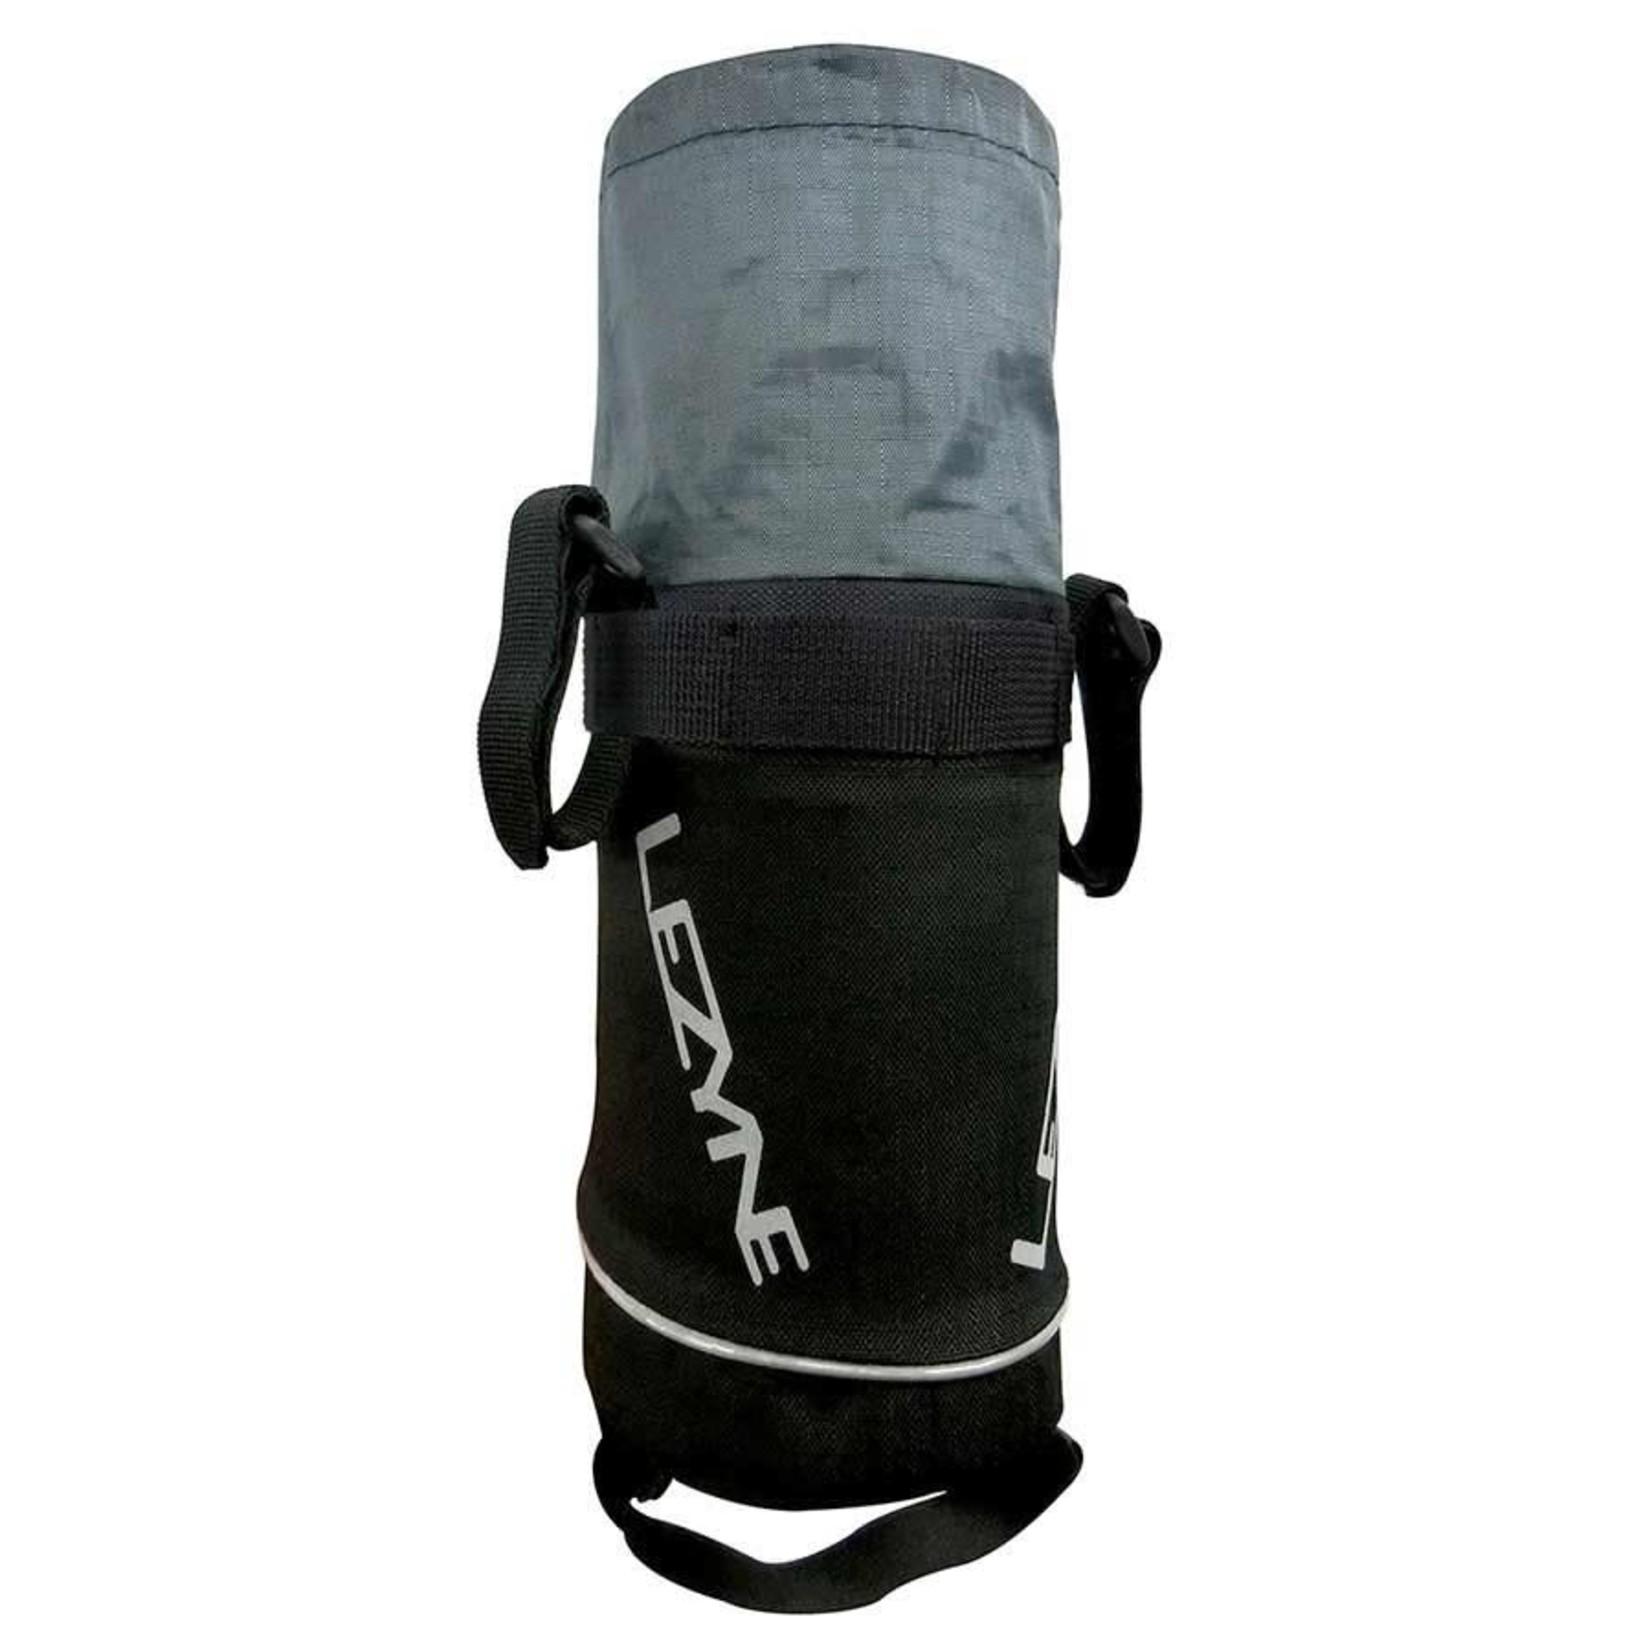 Lezyne, Stuff Caddy, Handlebar Bag